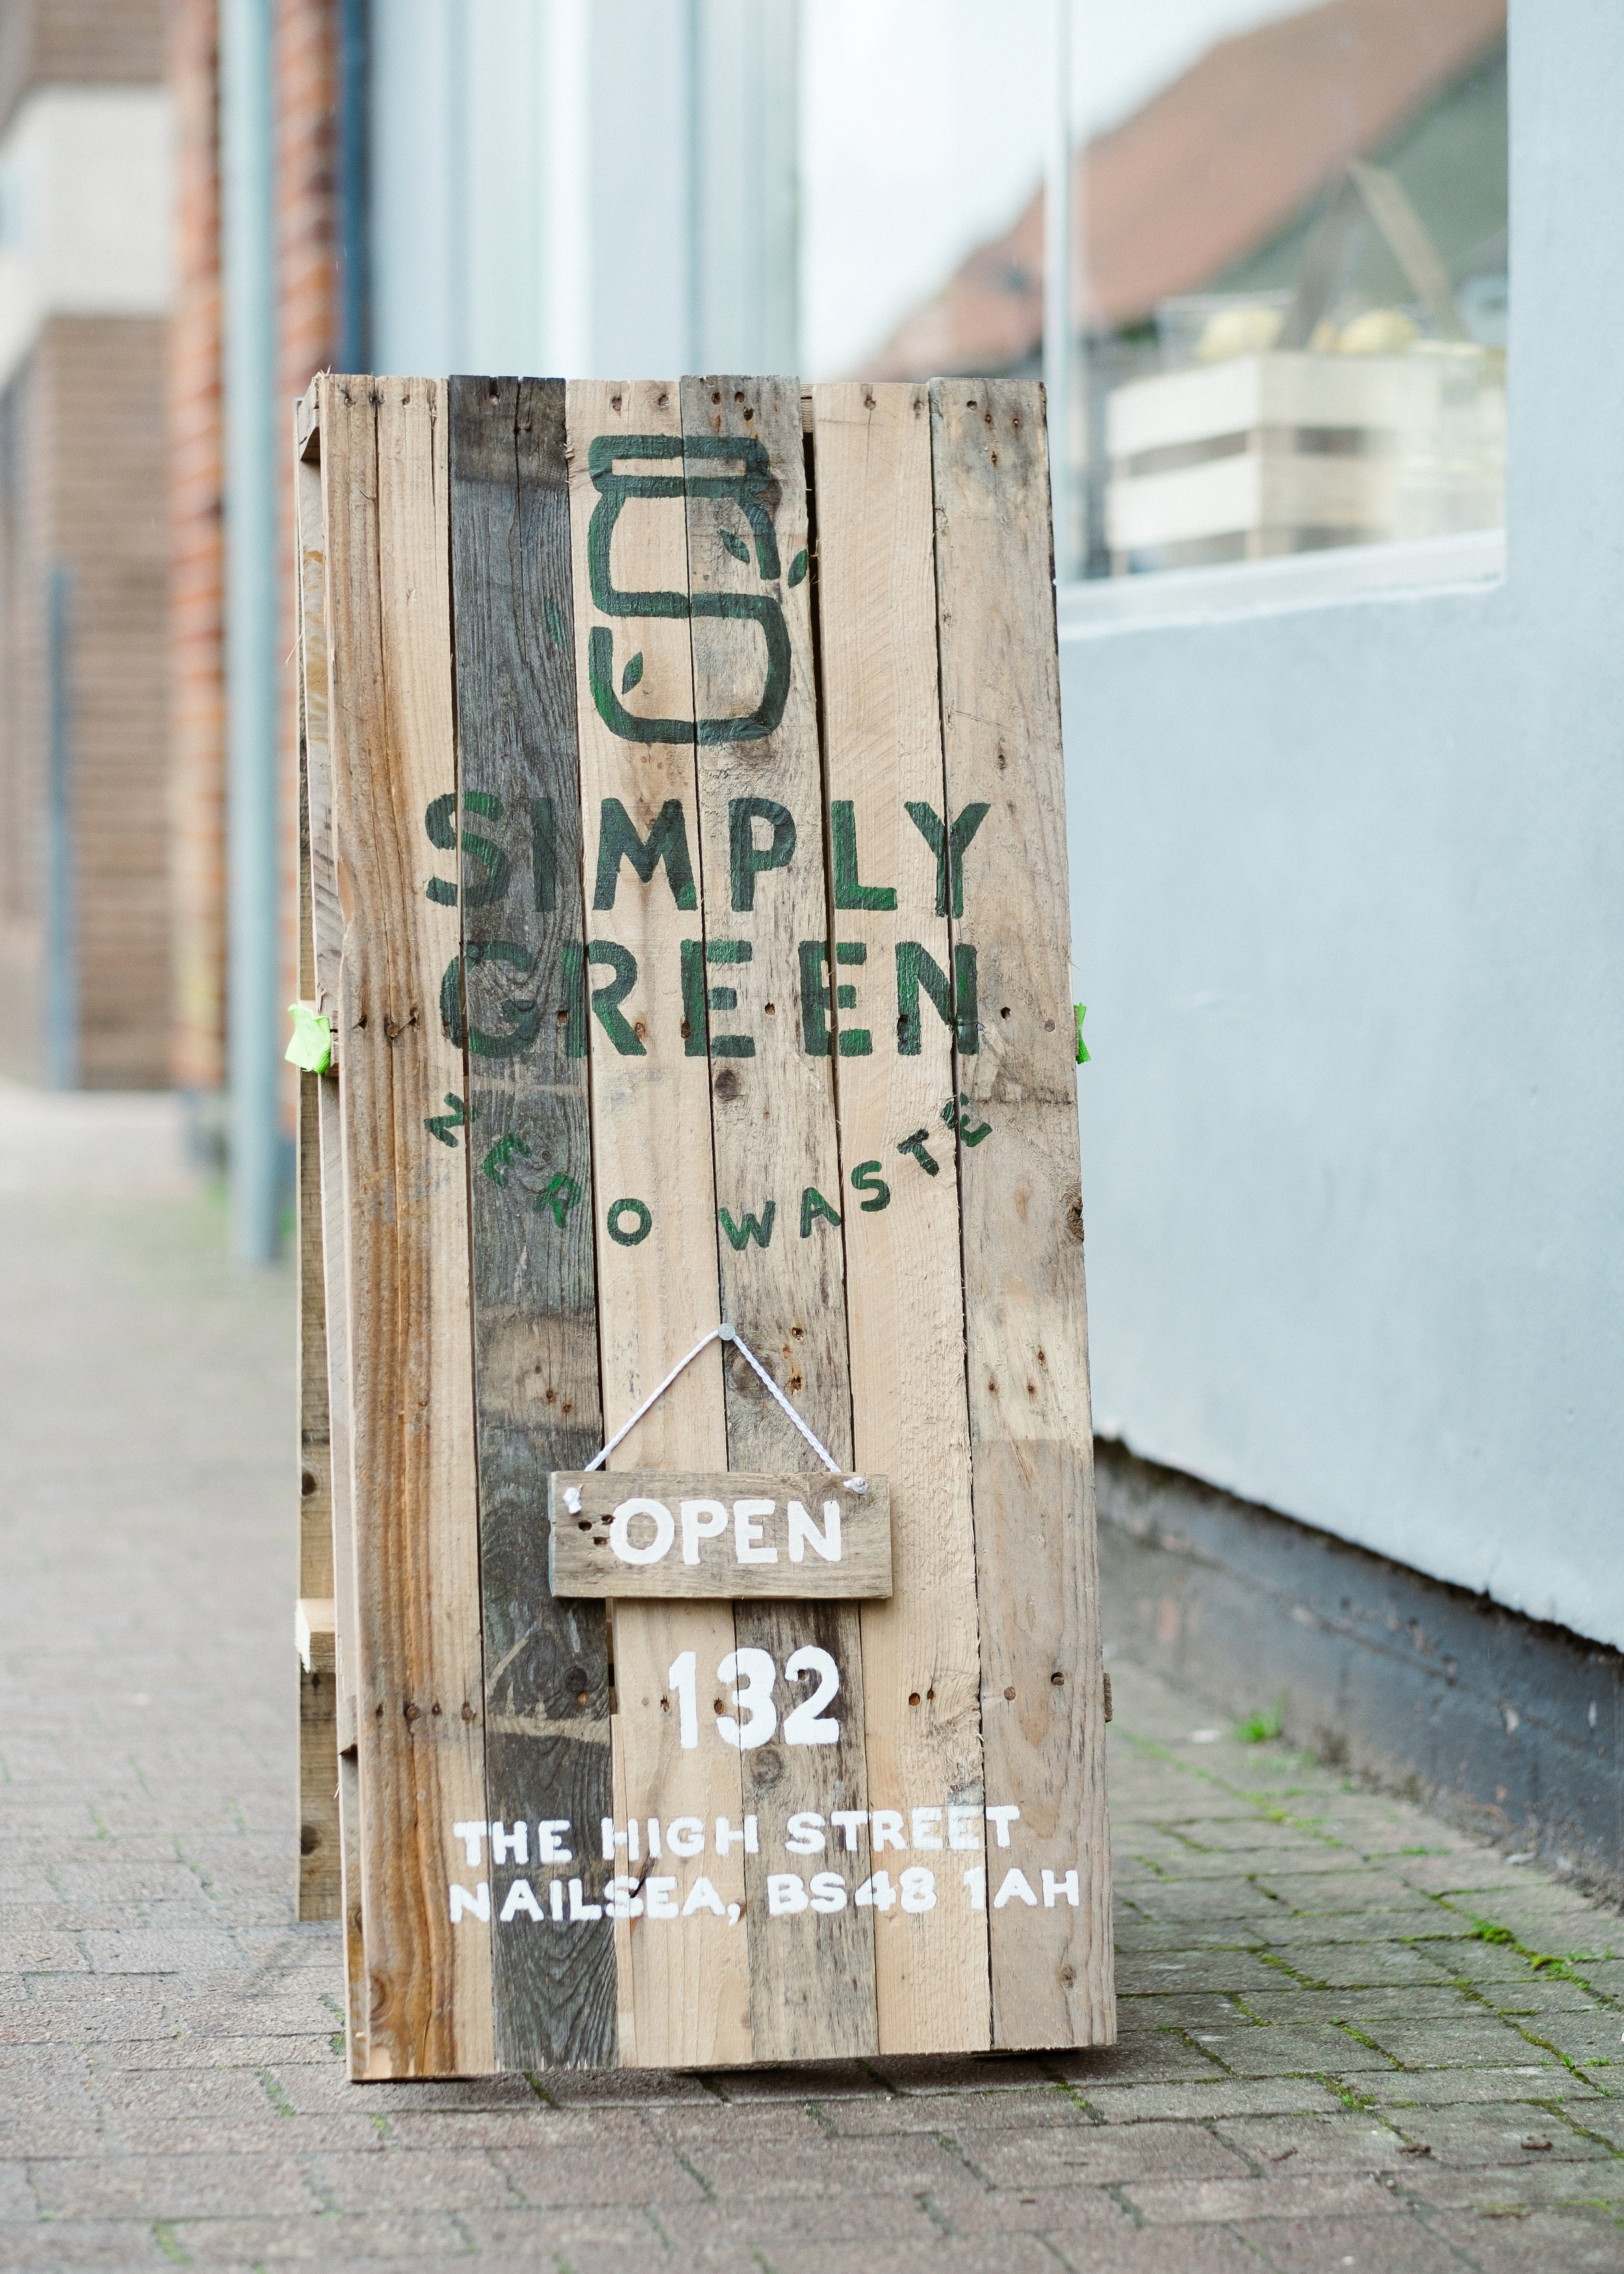 Simply Green 59.jpg